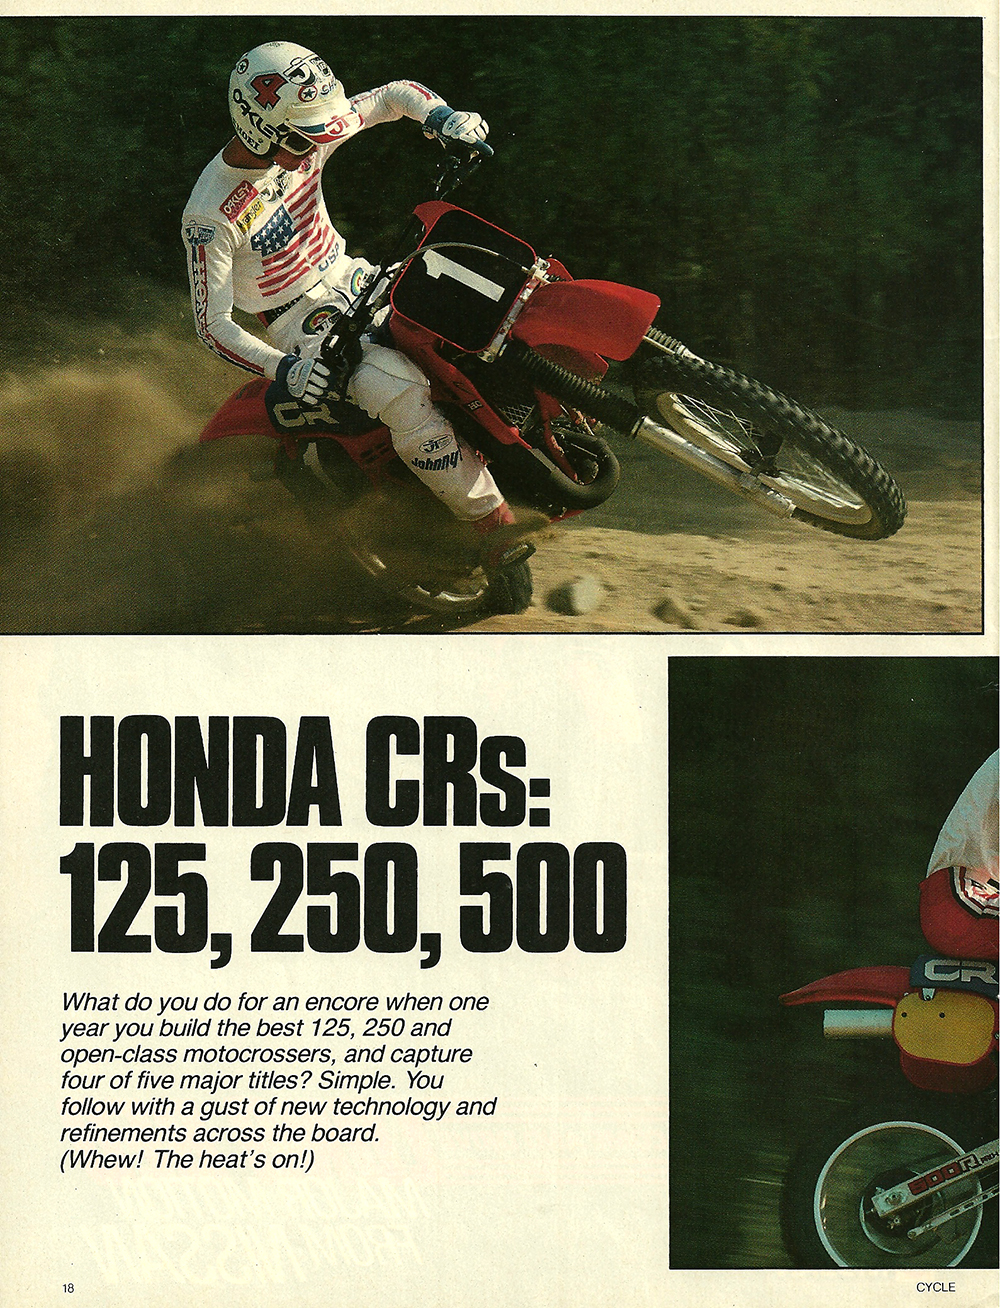 1984 Honda CR 125 250 500 road test 01.jpg